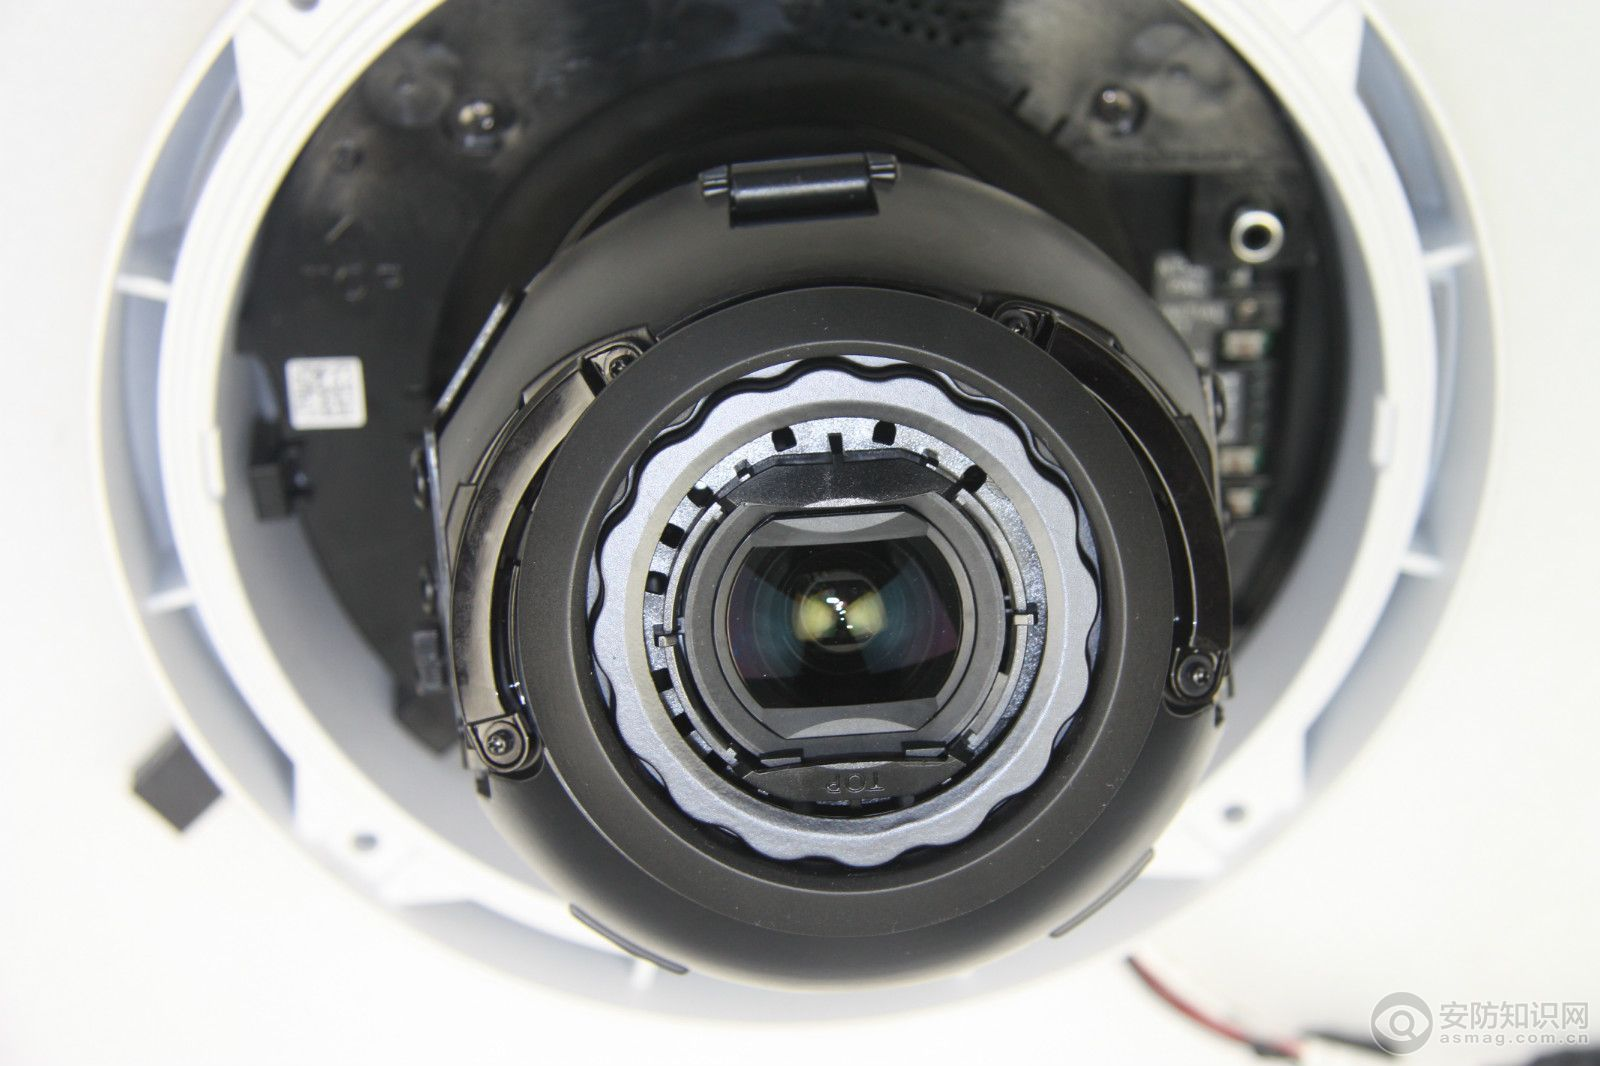 Introducing 4k Vandal Proof Ip Dome Camera Wv Sfv781lh Panasonic Ptz Wiring Diagram Block Zoom Lens